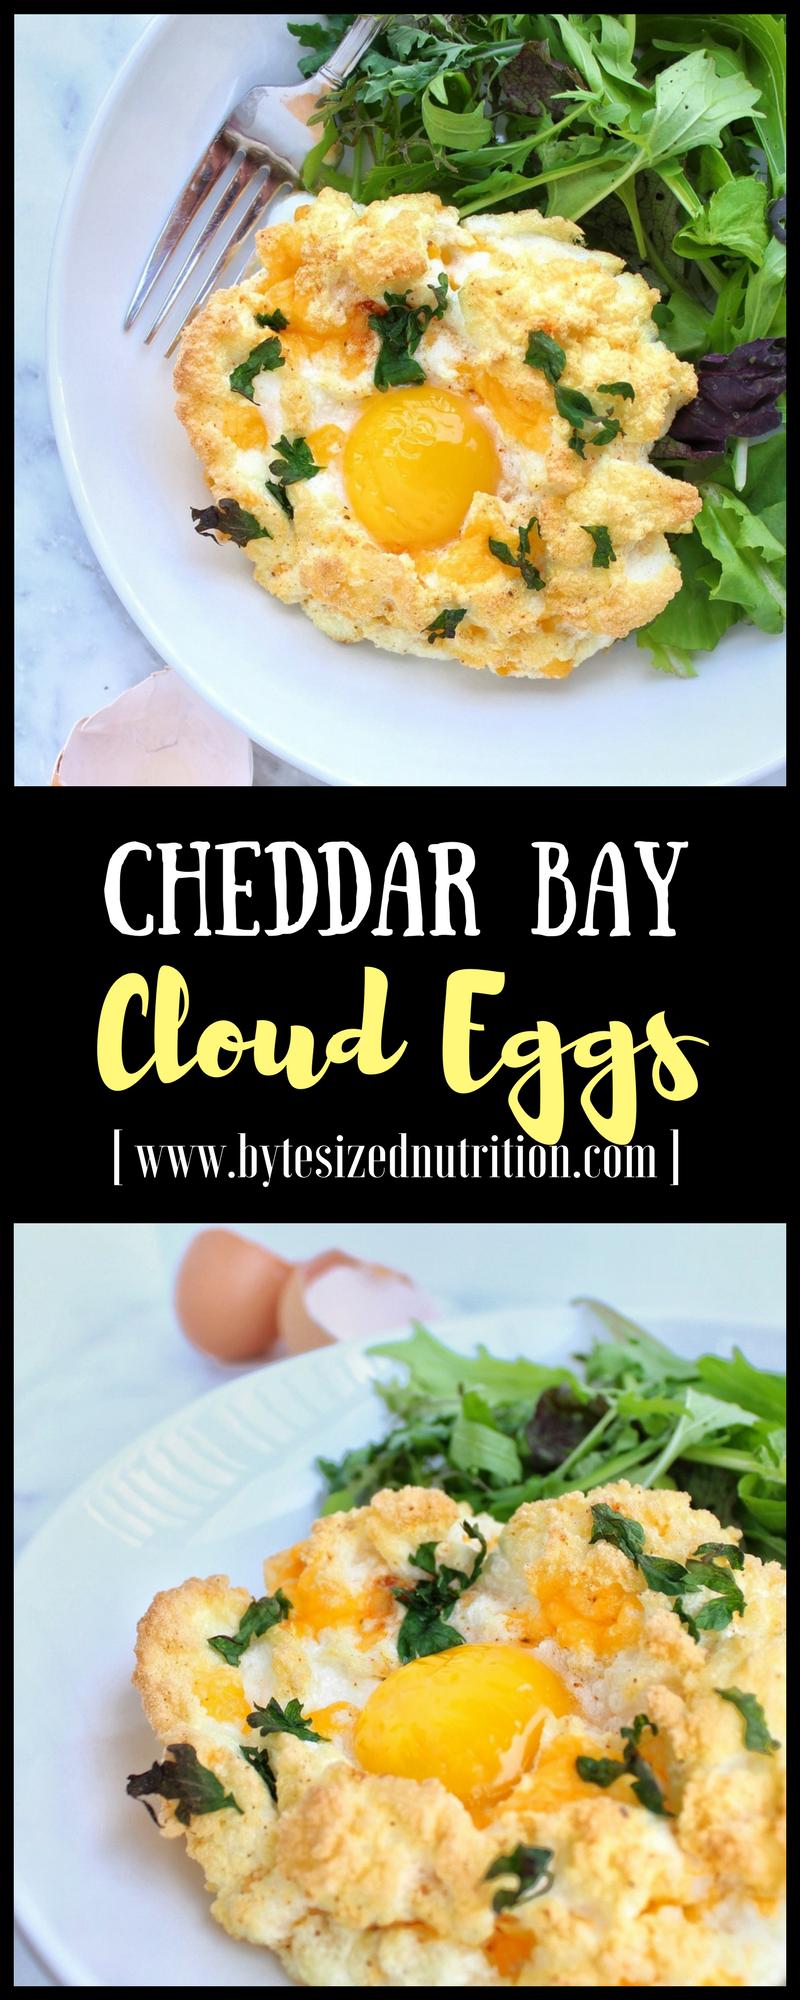 Cheddar Bay Cloud Eggs Recipe Cheddar bay biscuits